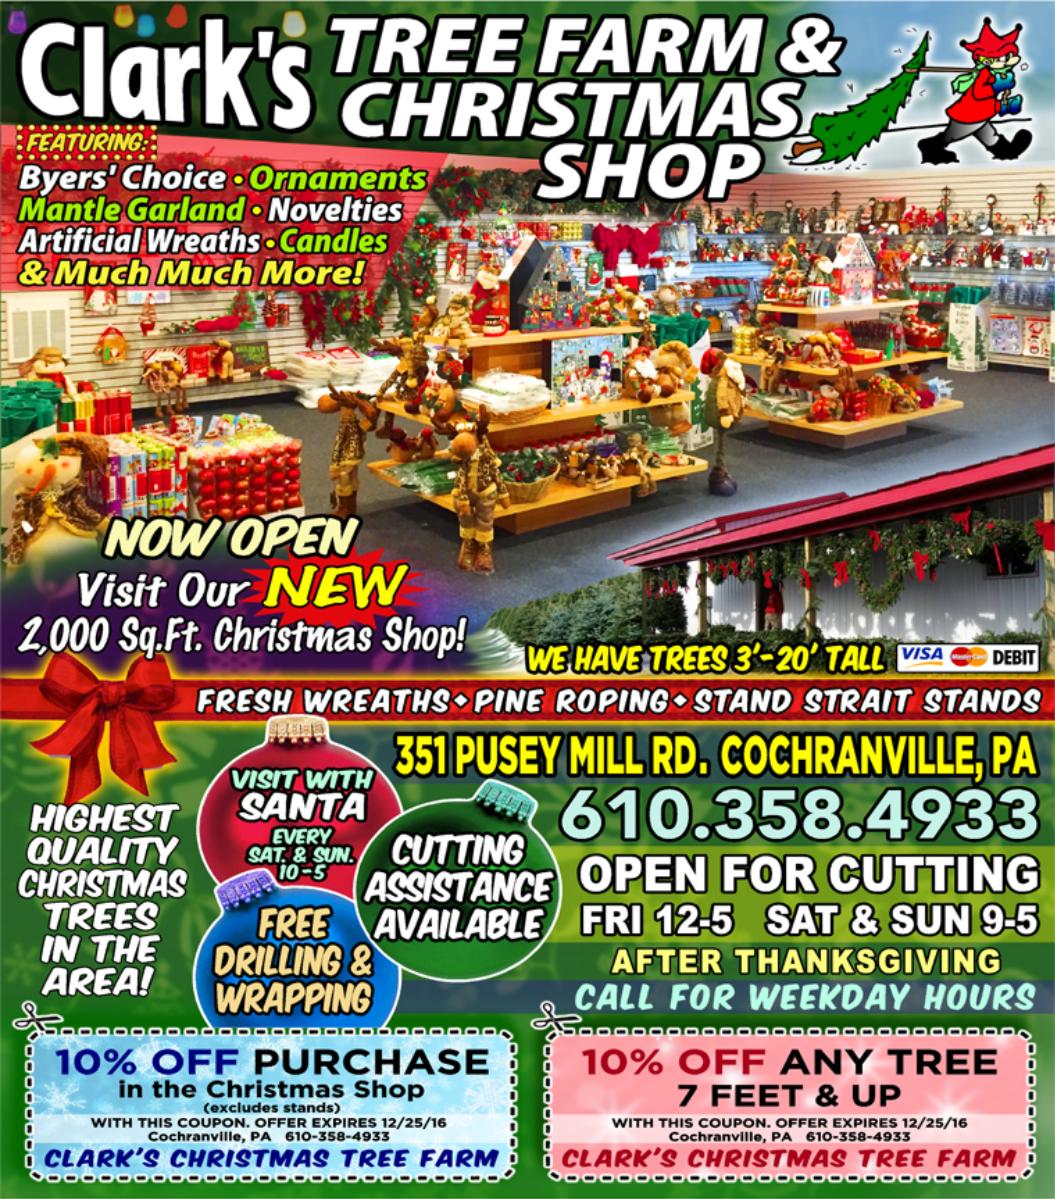 Clark's Christmas Tree Farm and Christmas Shop